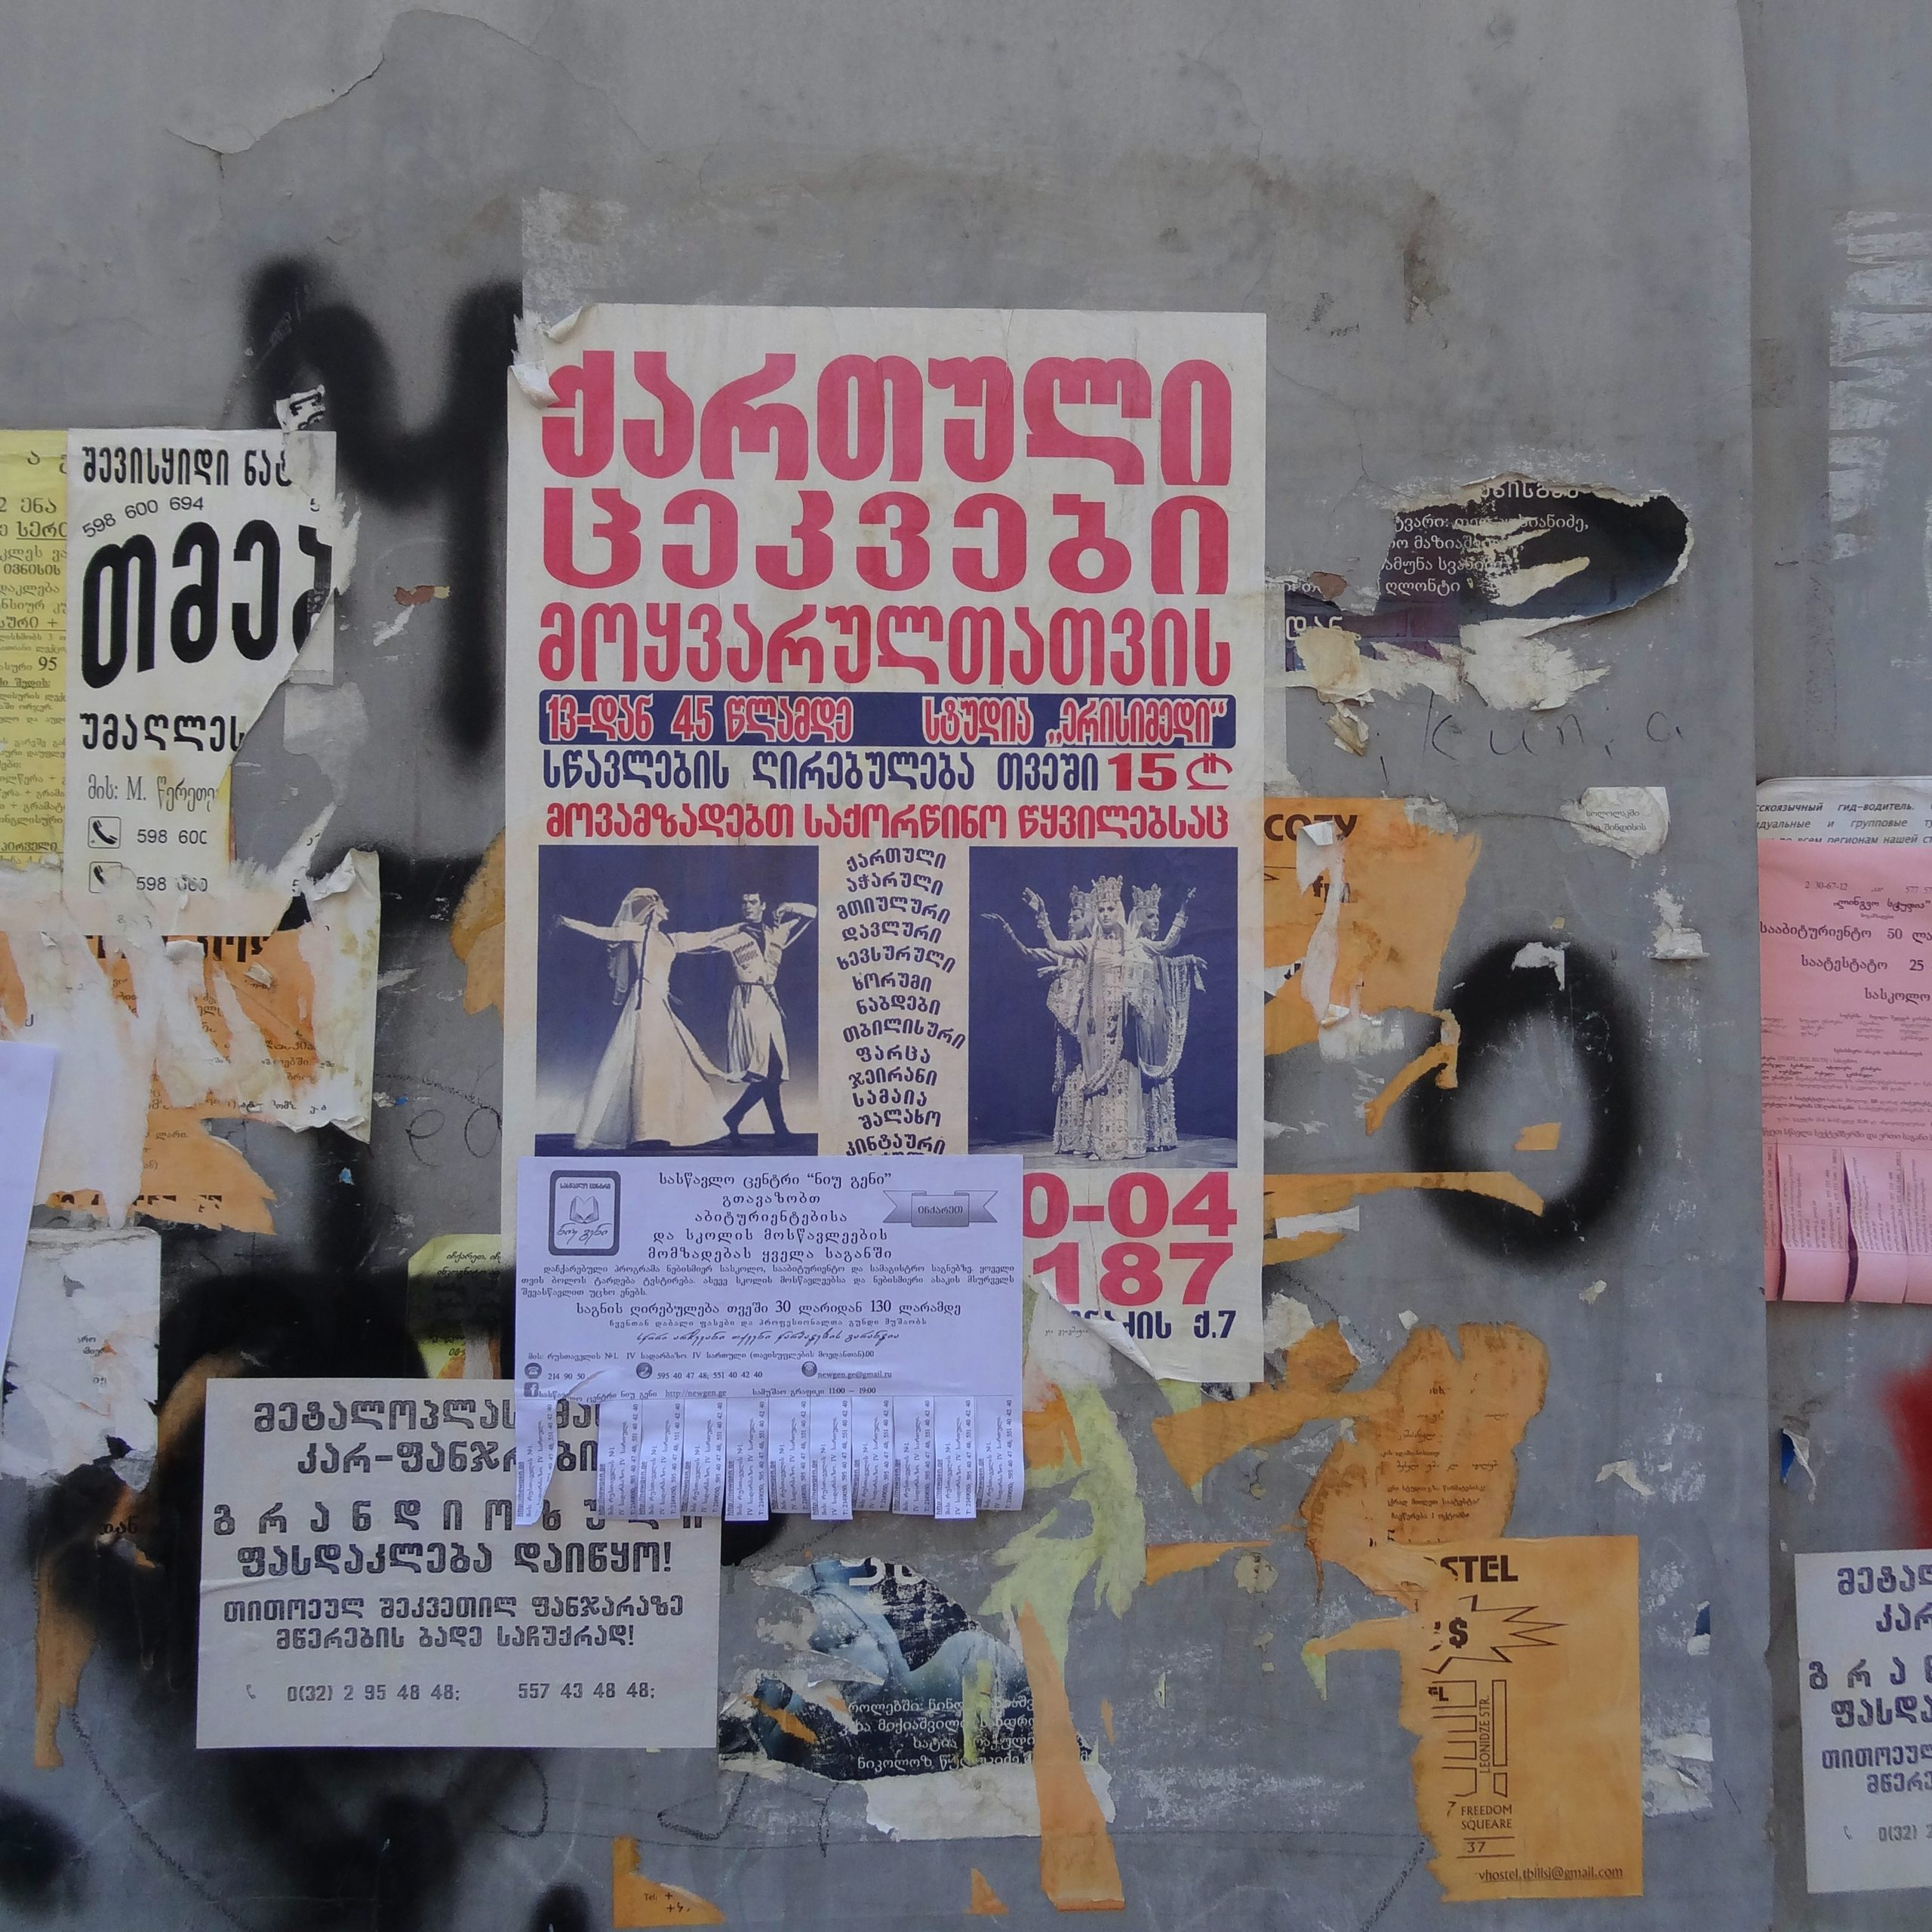 Tino Schlench - Literaturpalast - Tiflis - plakatierte Wand